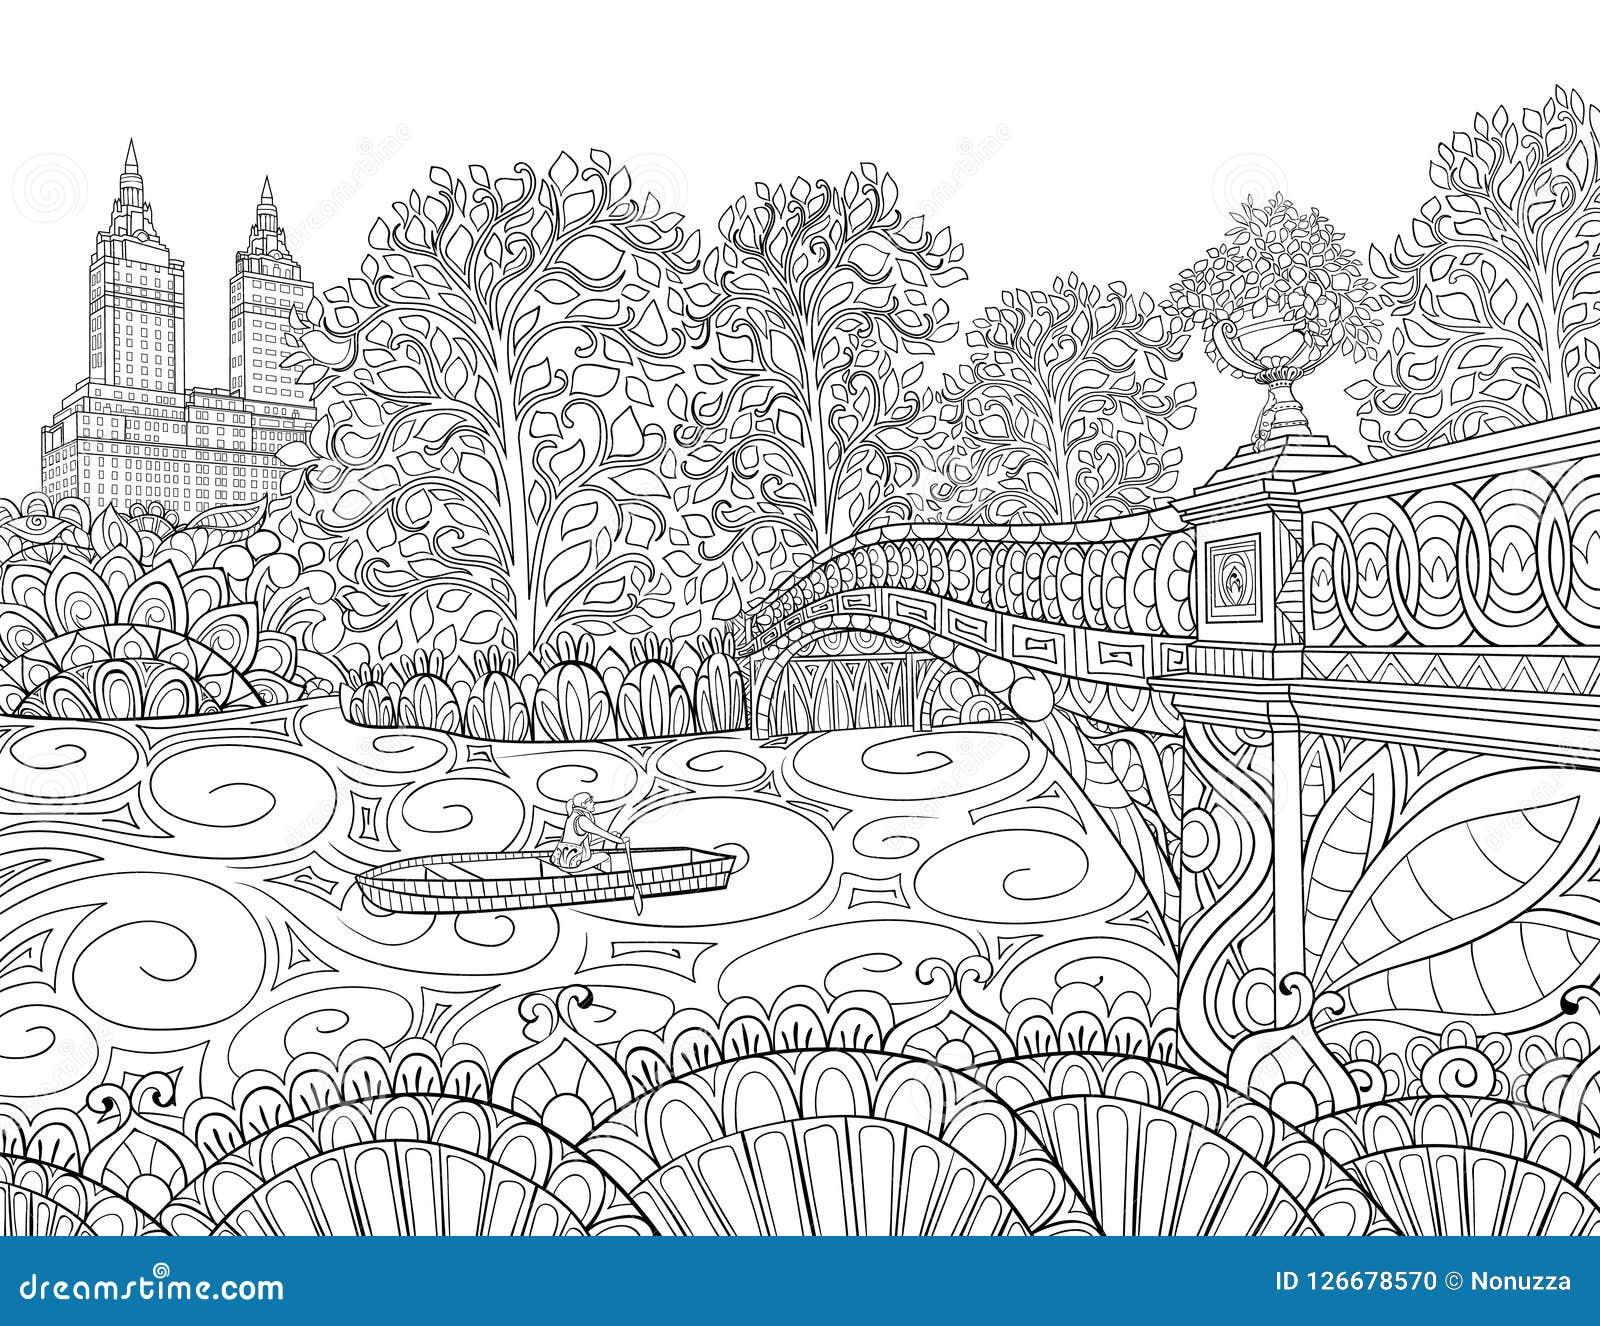 adult coloring book page landscape image relaxing landcsape trees road image relaxing line art style